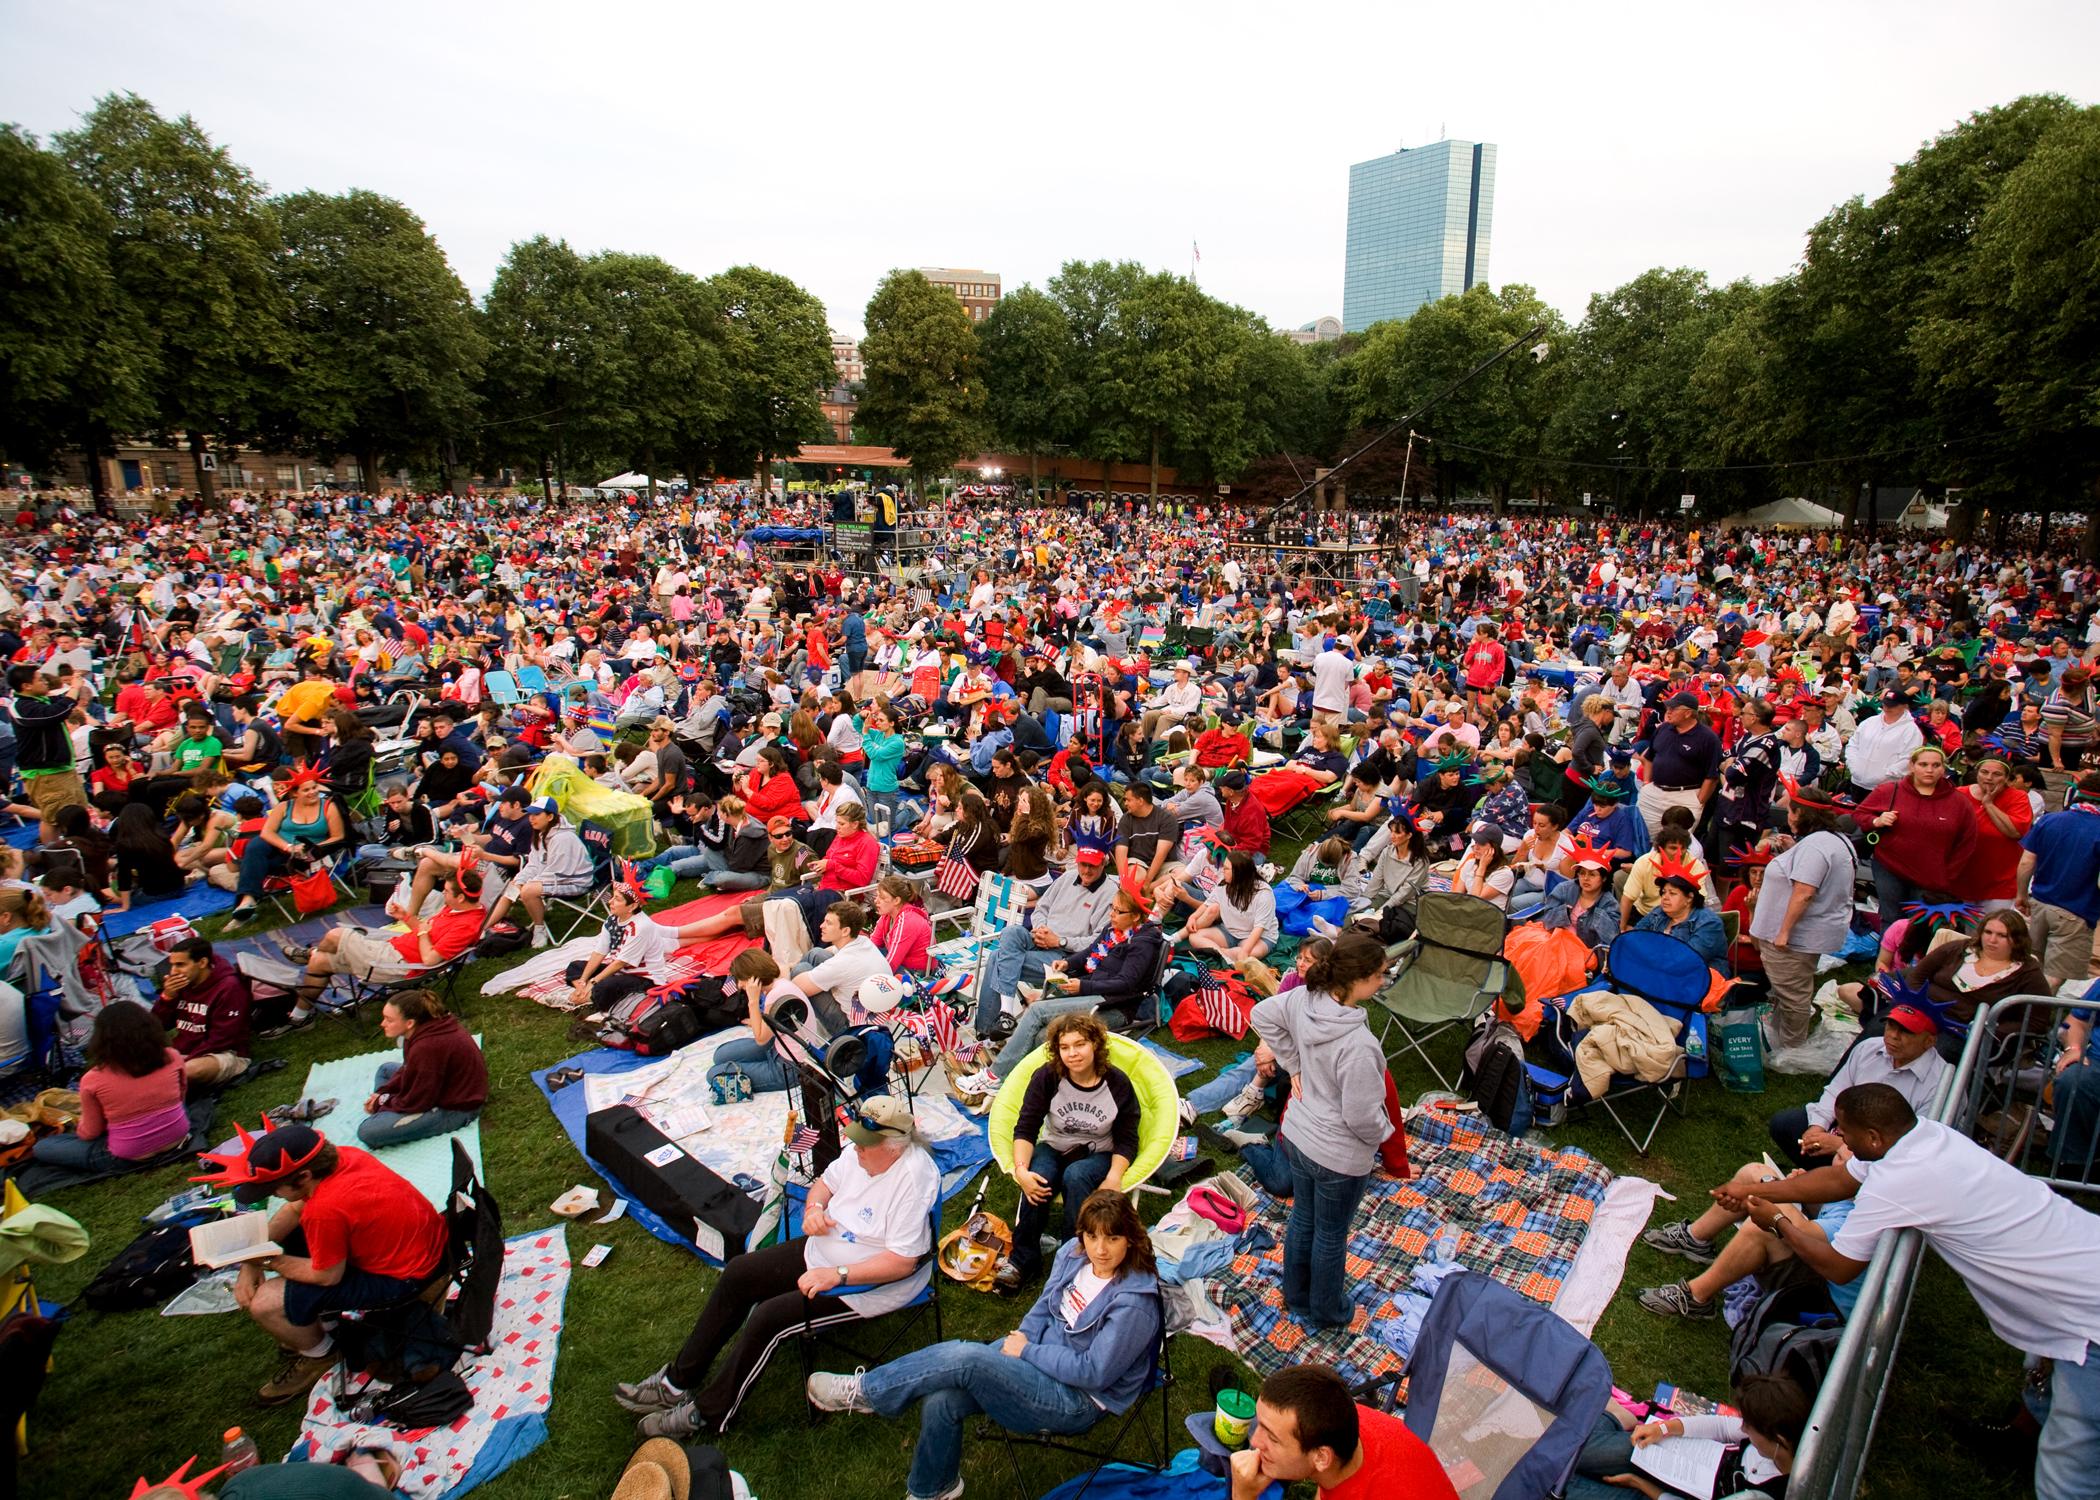 boston events concerts festivals marathons exhibits